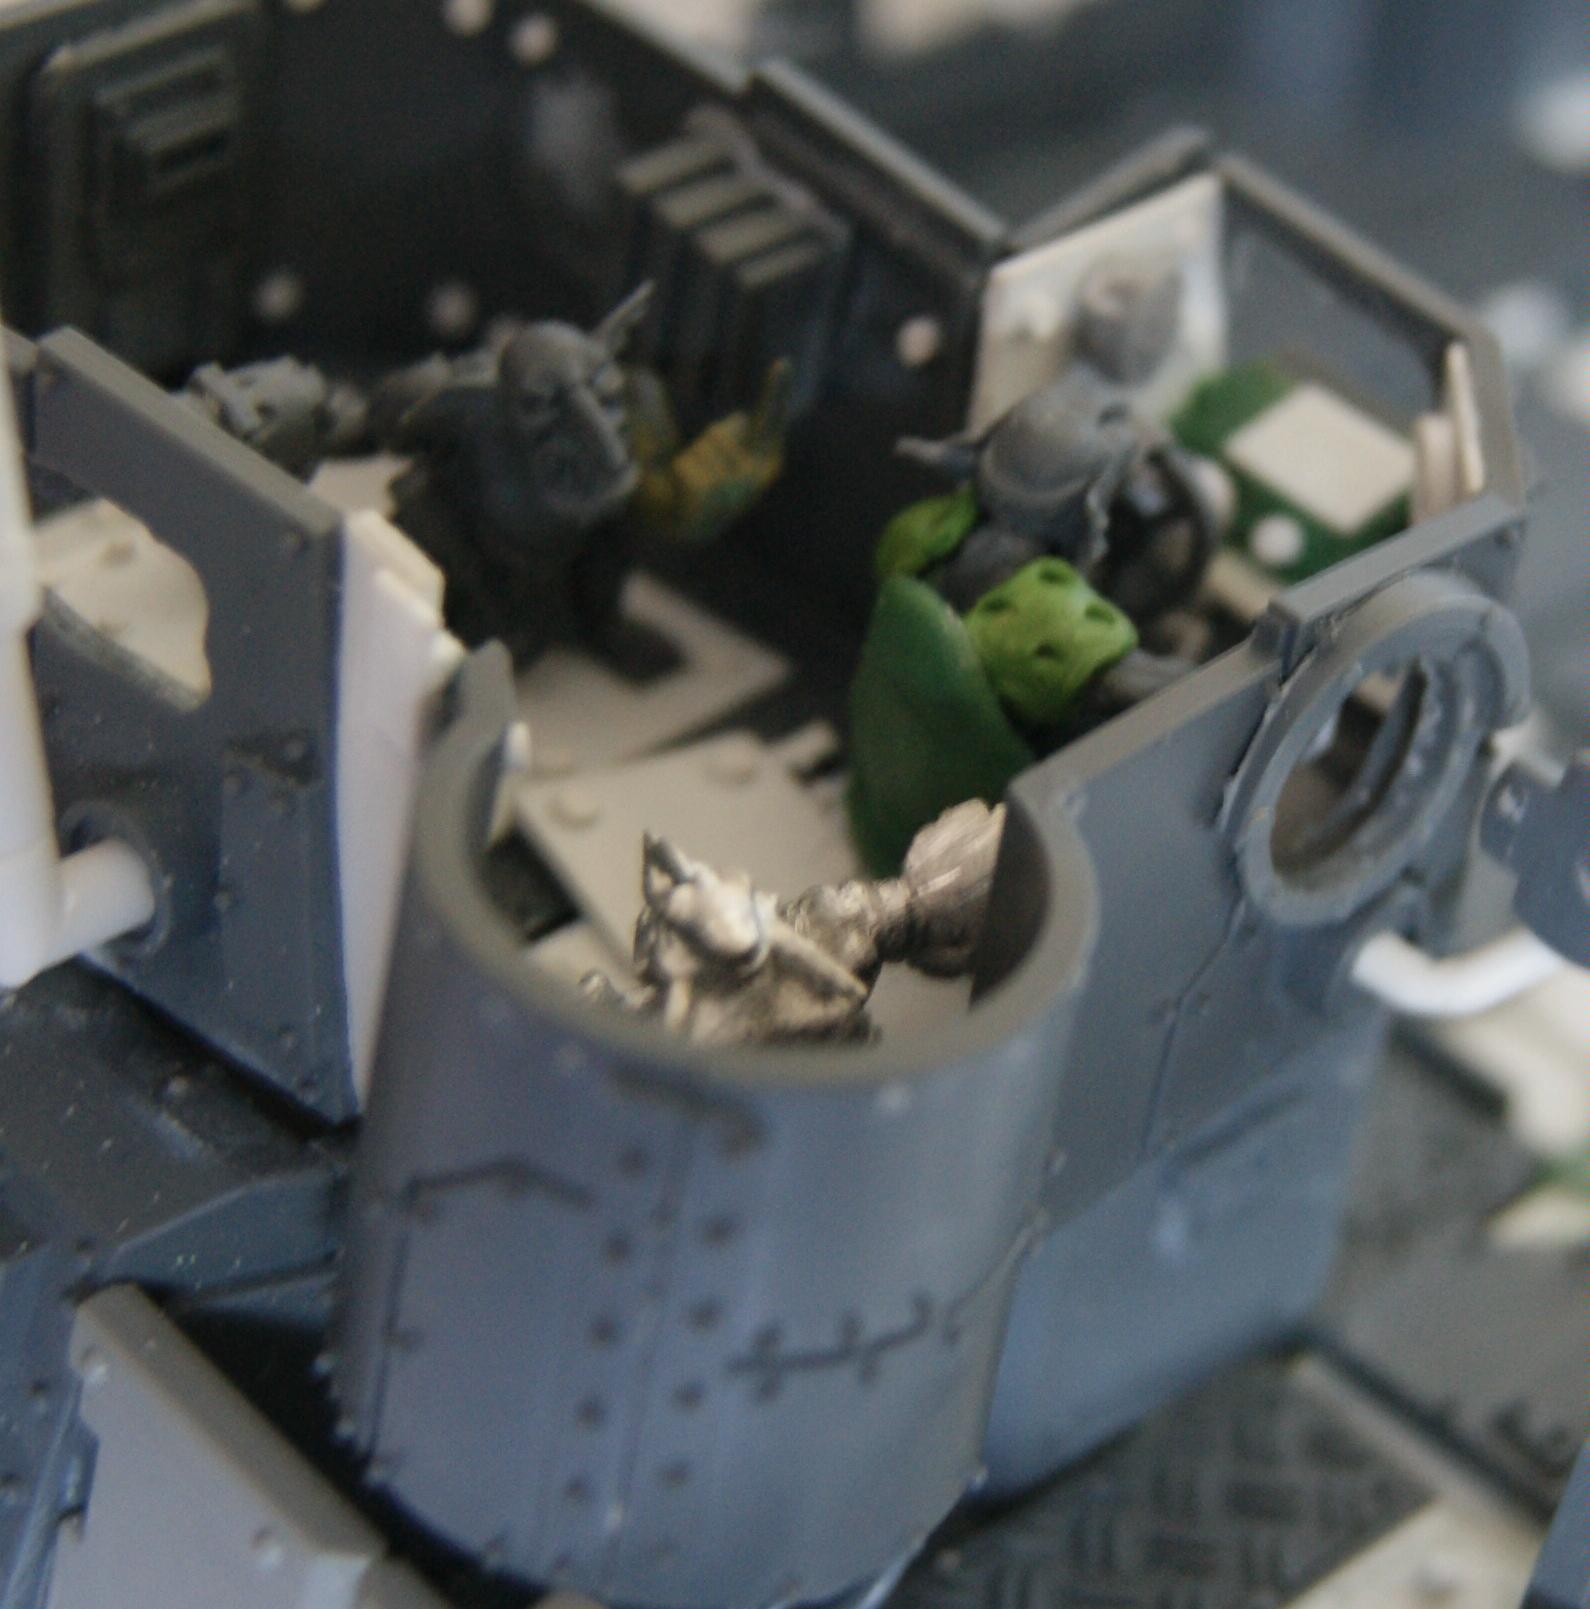 Battlewagon, Conversion, Grot Rebellion, Grot Rebels, Grots, Orks, Warhammer 40,000